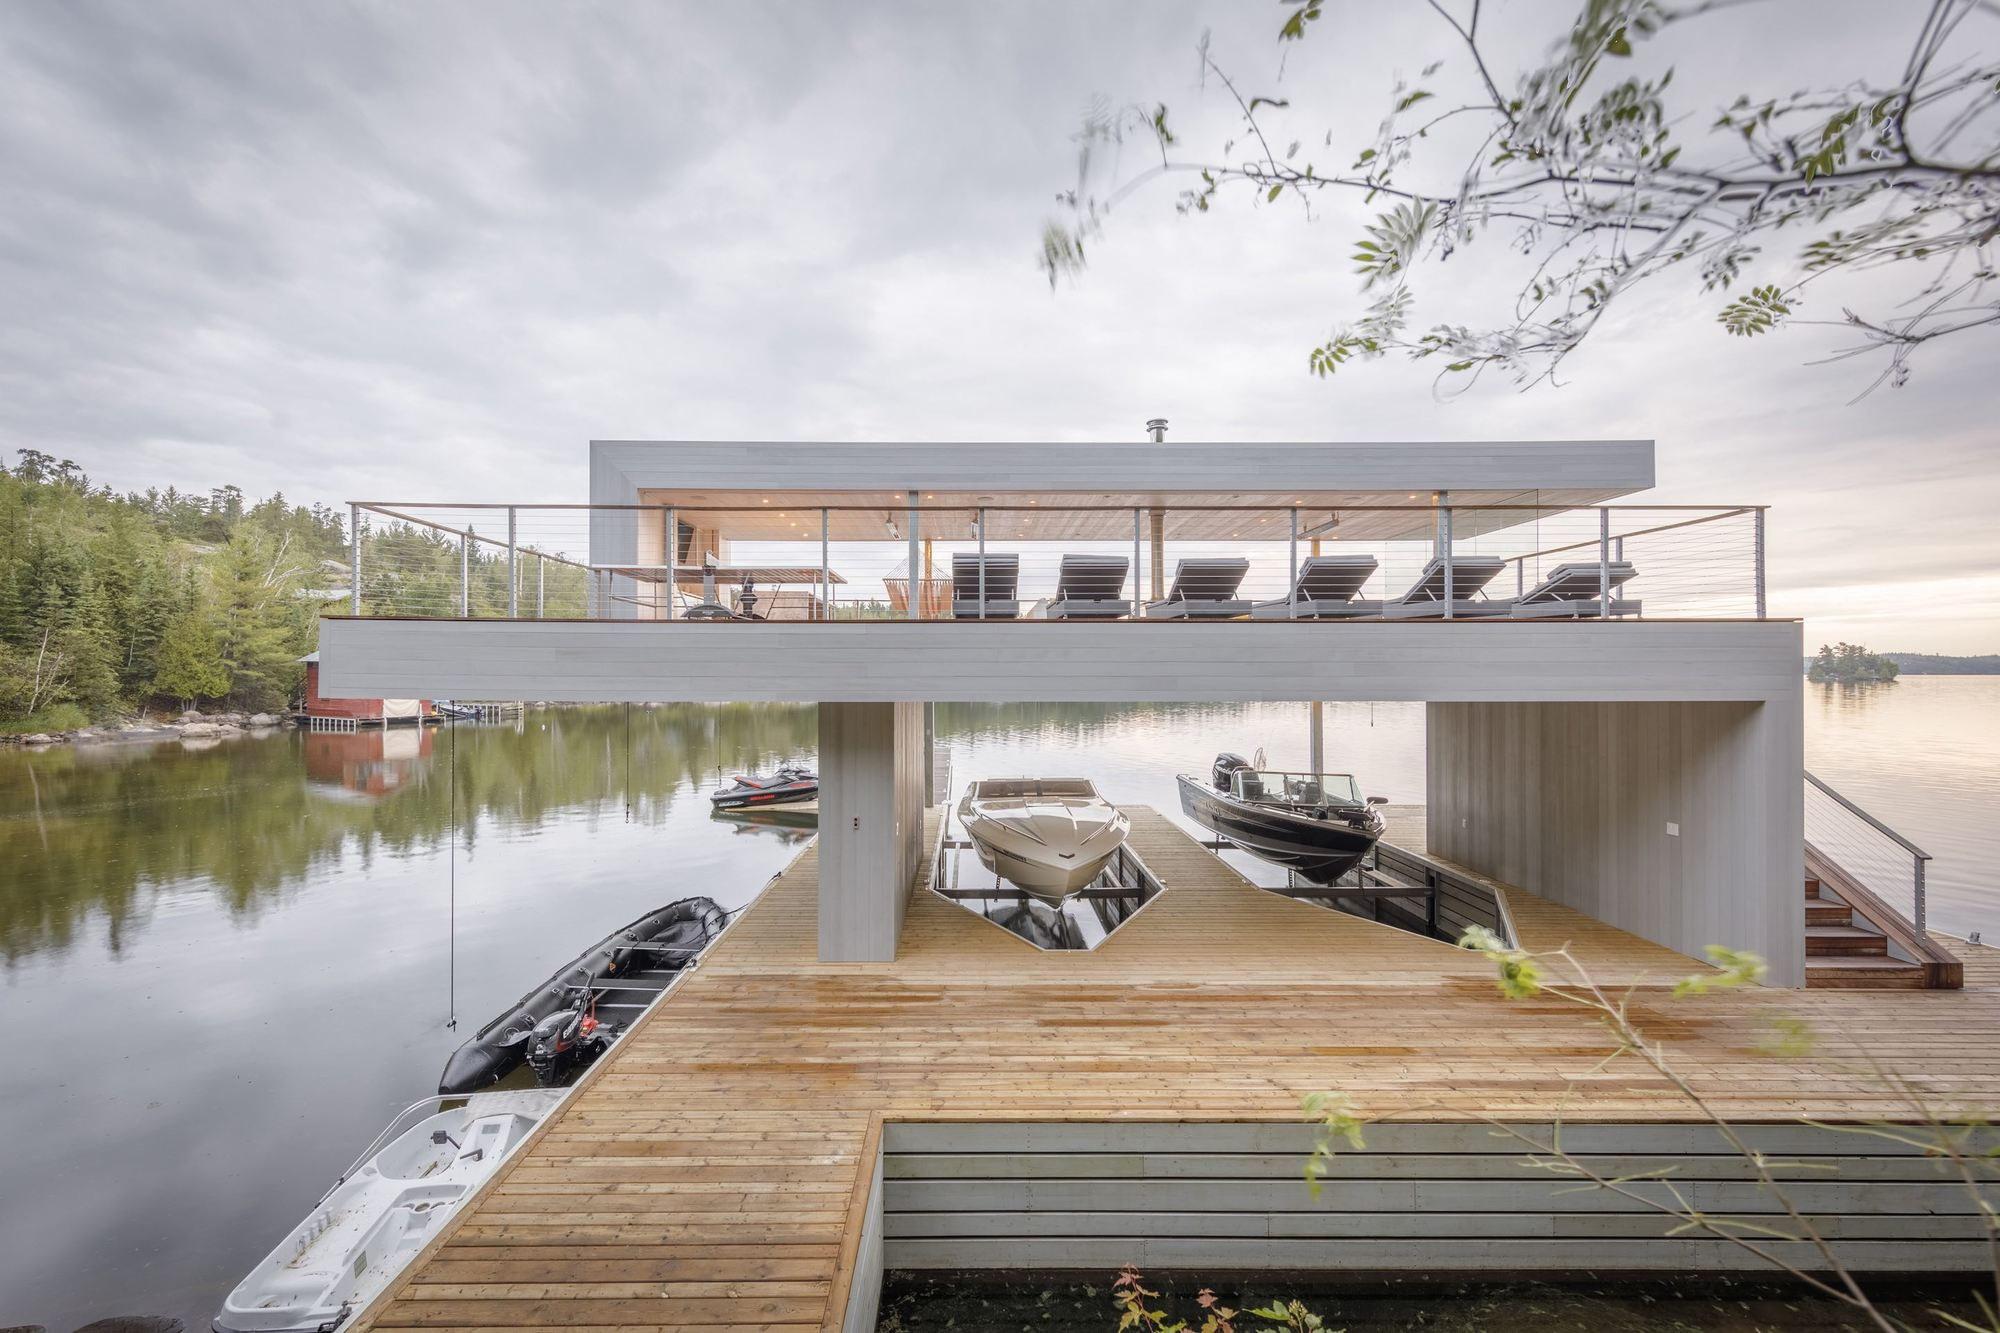 Boathouse by Cibinel Architecture